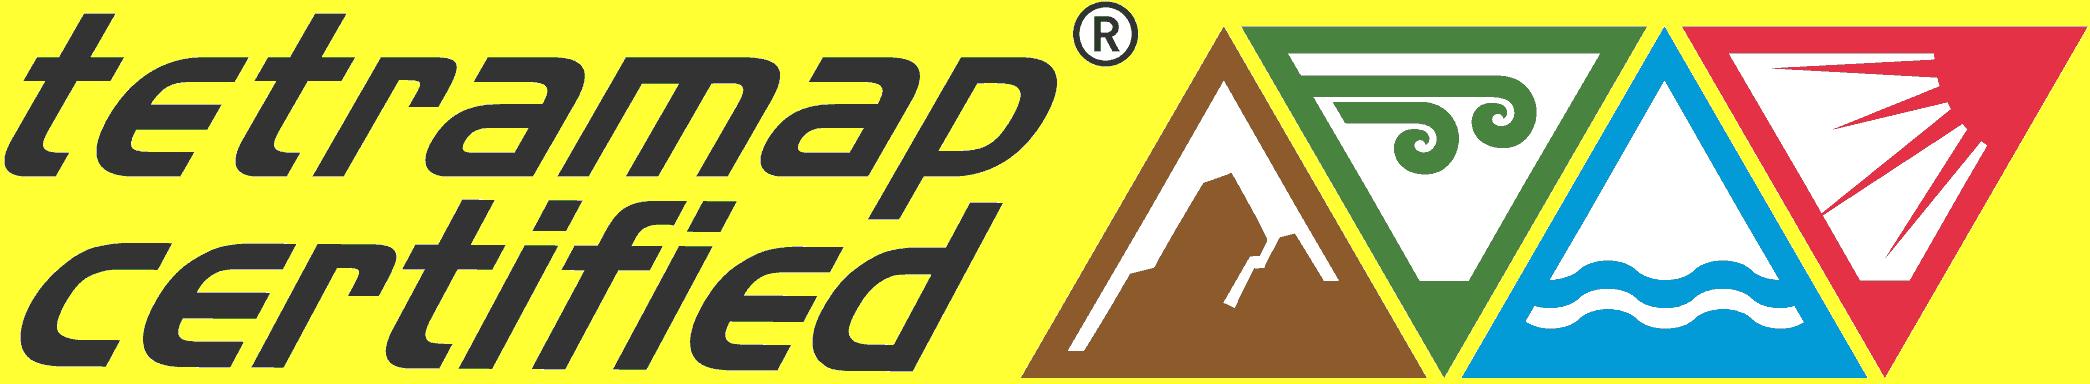 Tetramap certified